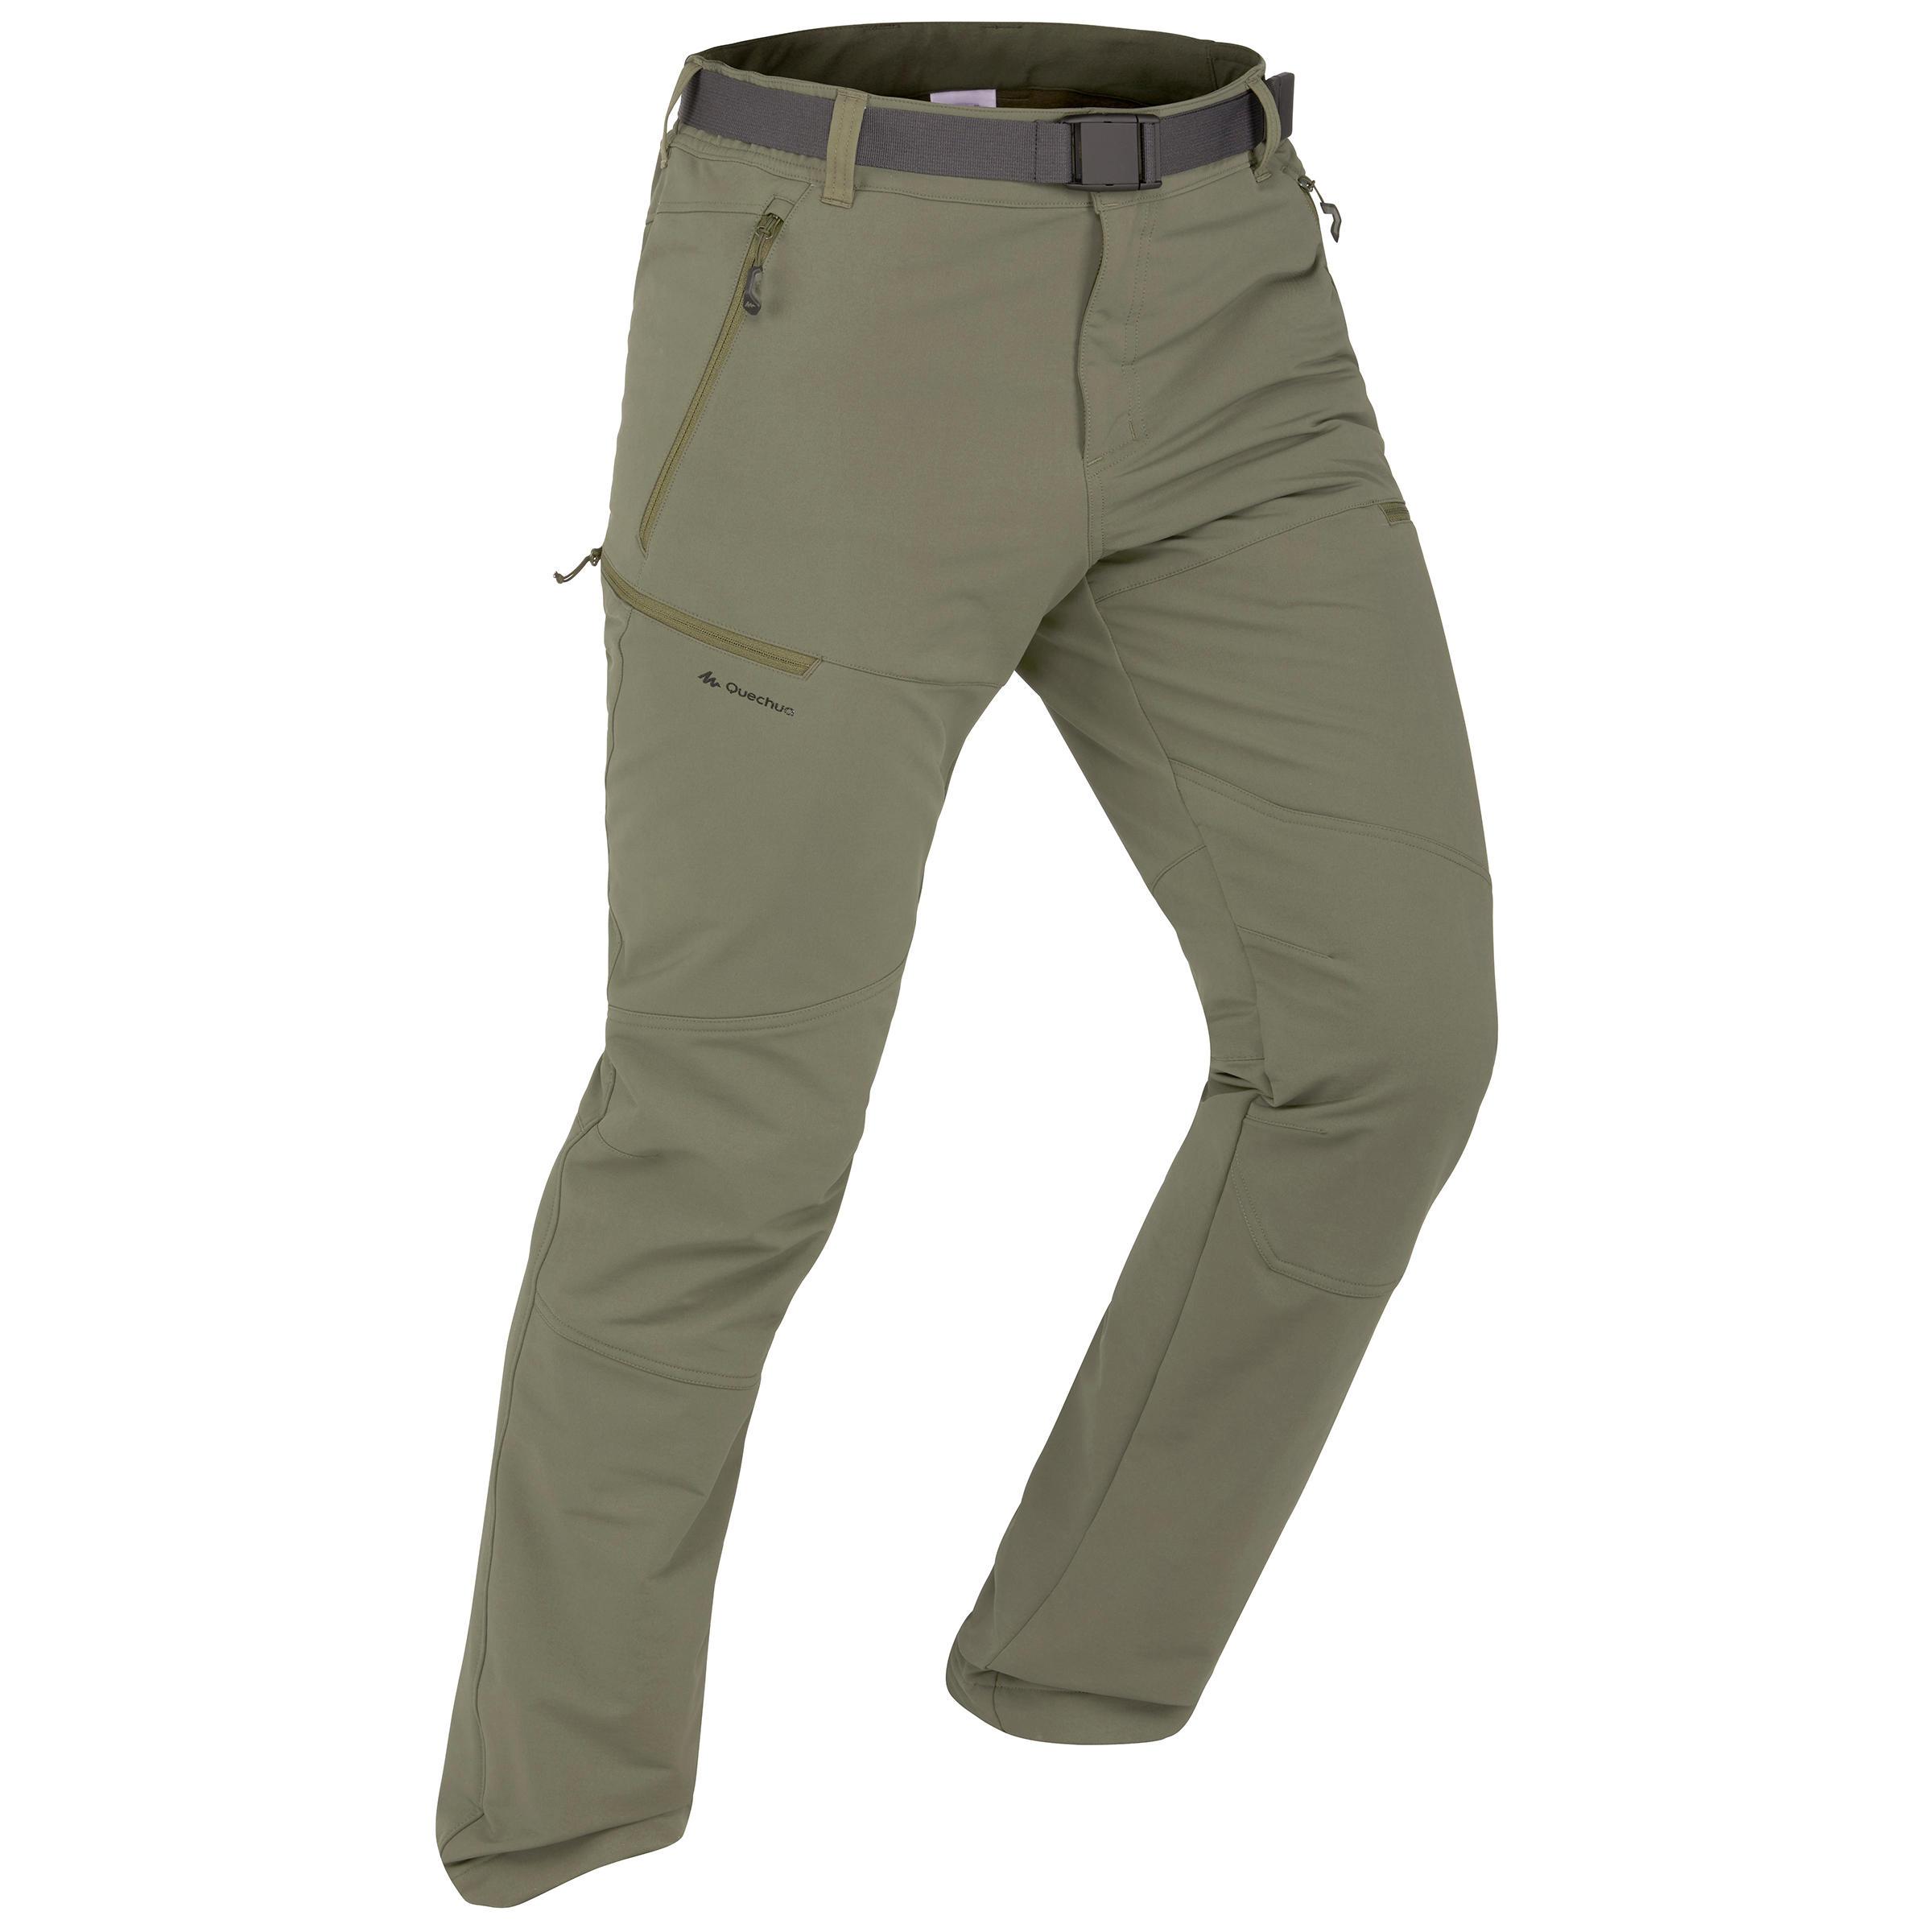 Softshellhose Winterwandern SH500 X-Warm Herren khaki | Sportbekleidung > Sporthosen > Softshellhosen | Quechua